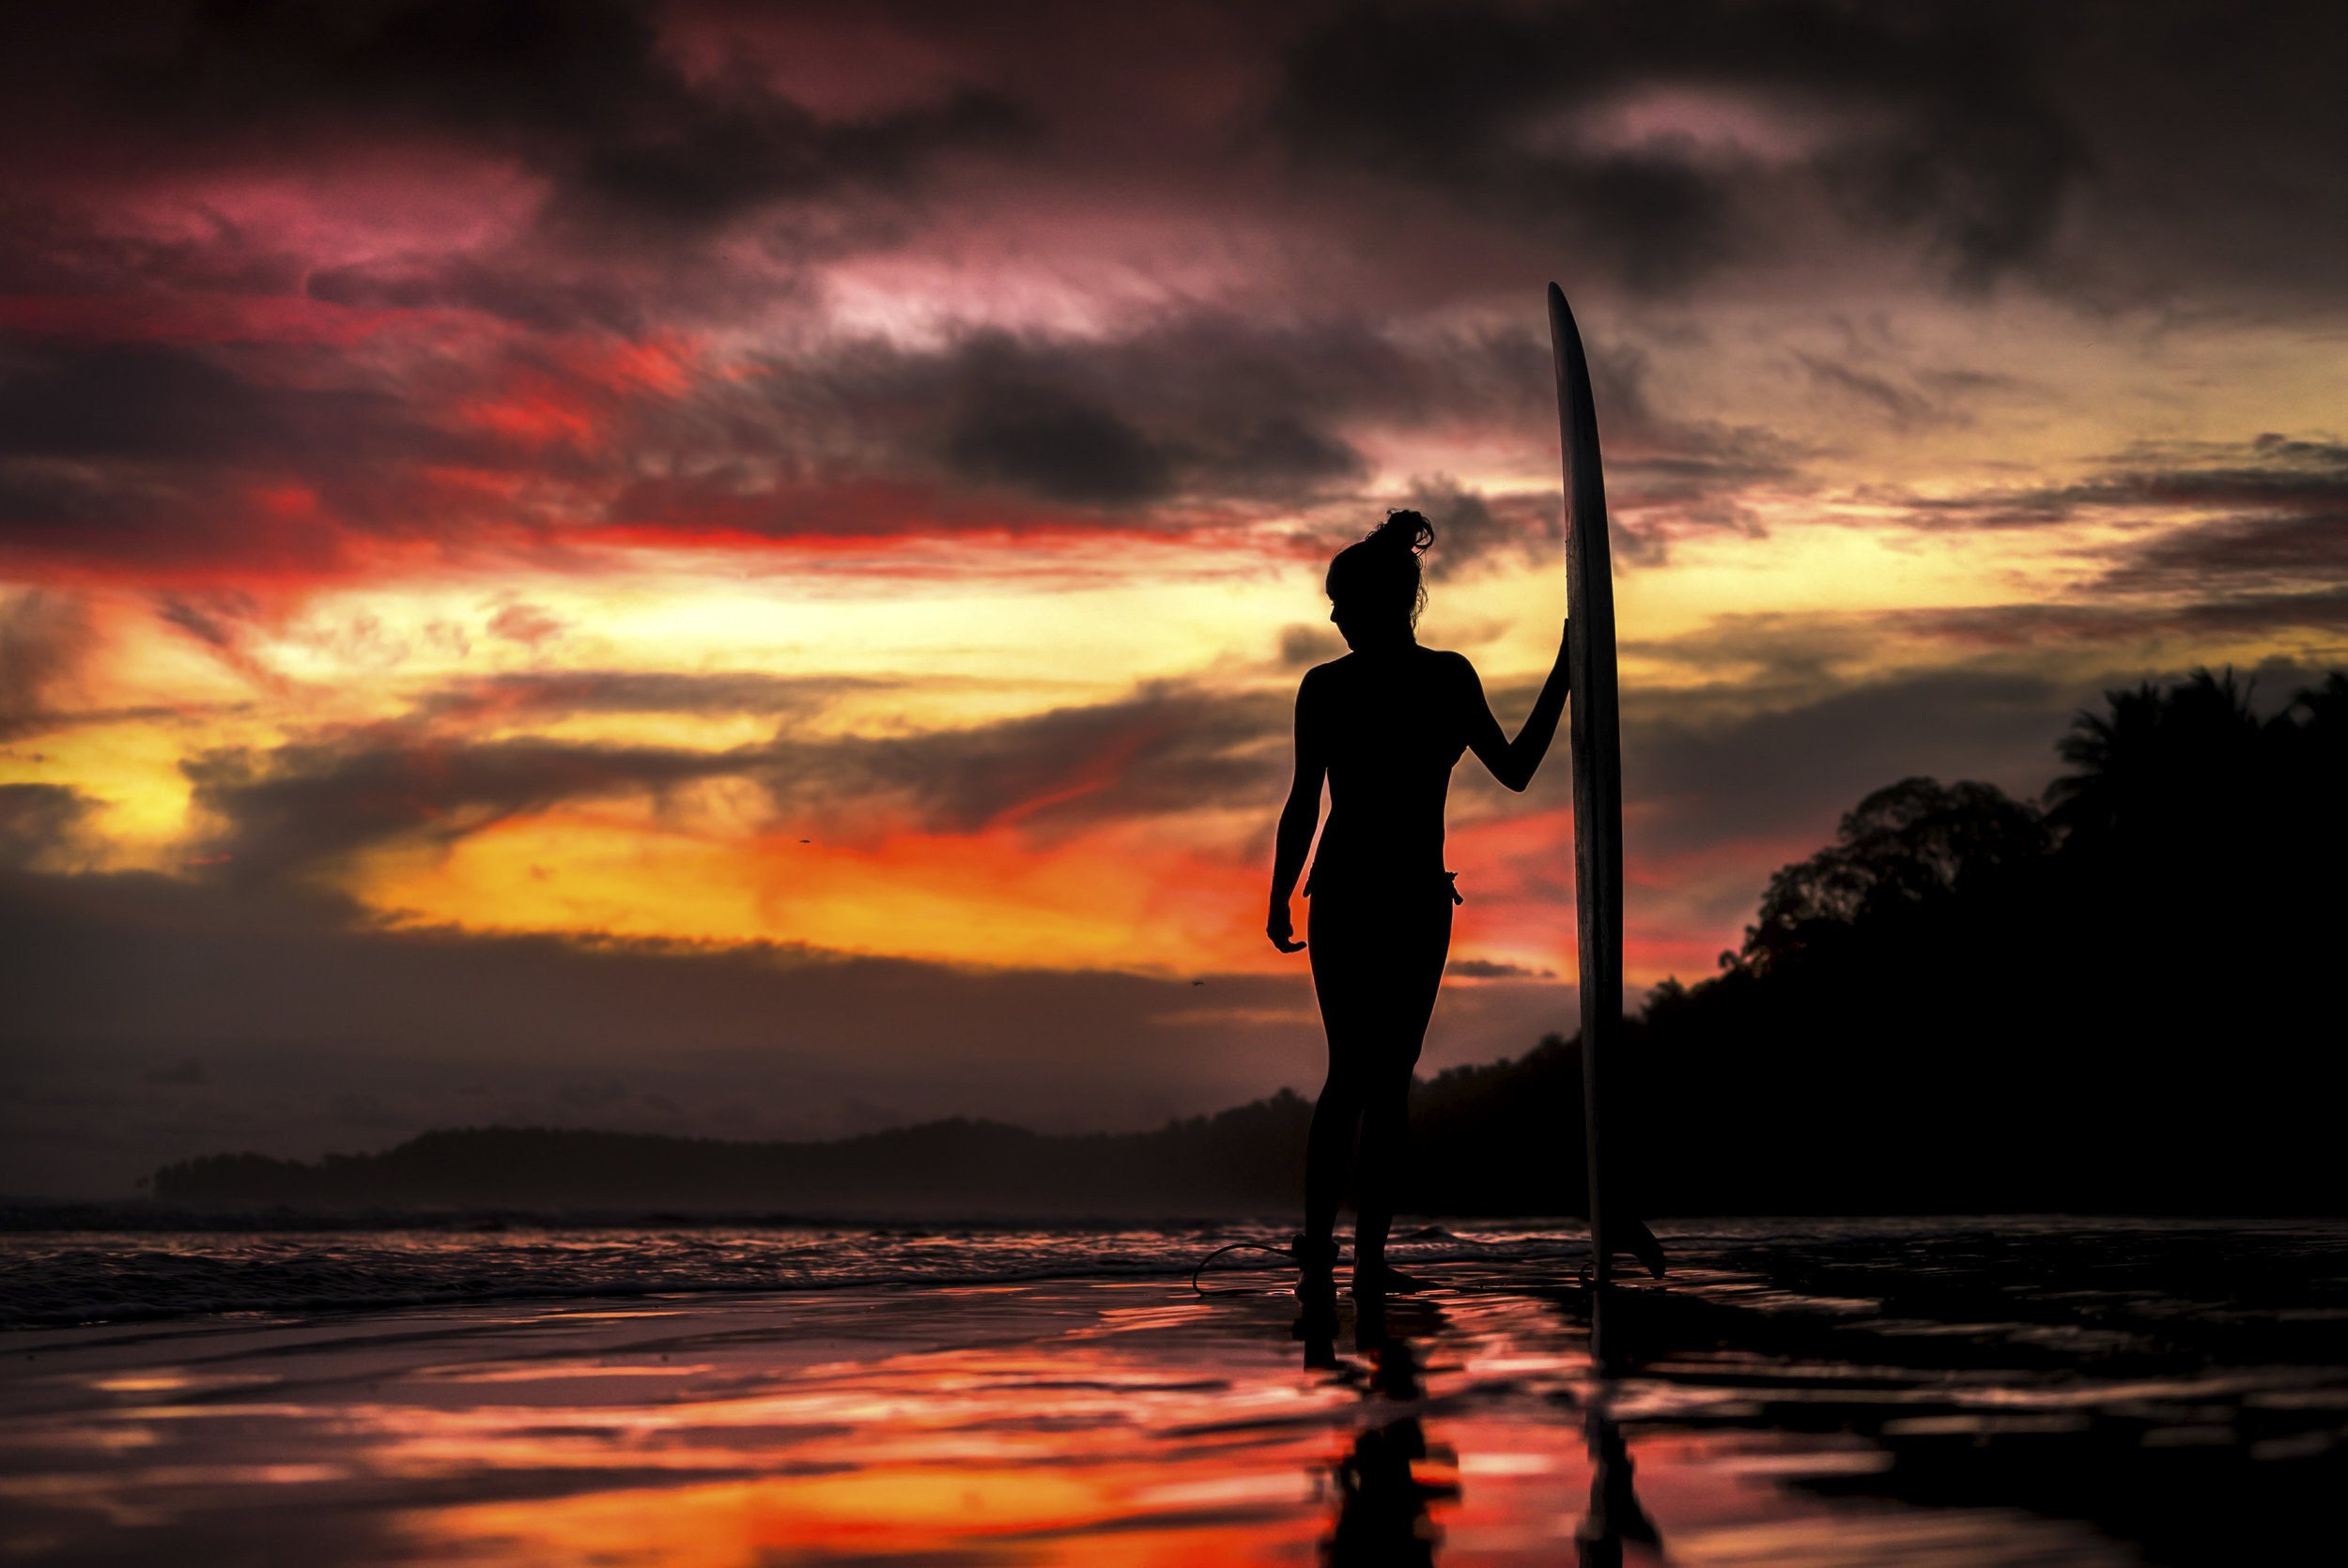 Surf girl sunset beach